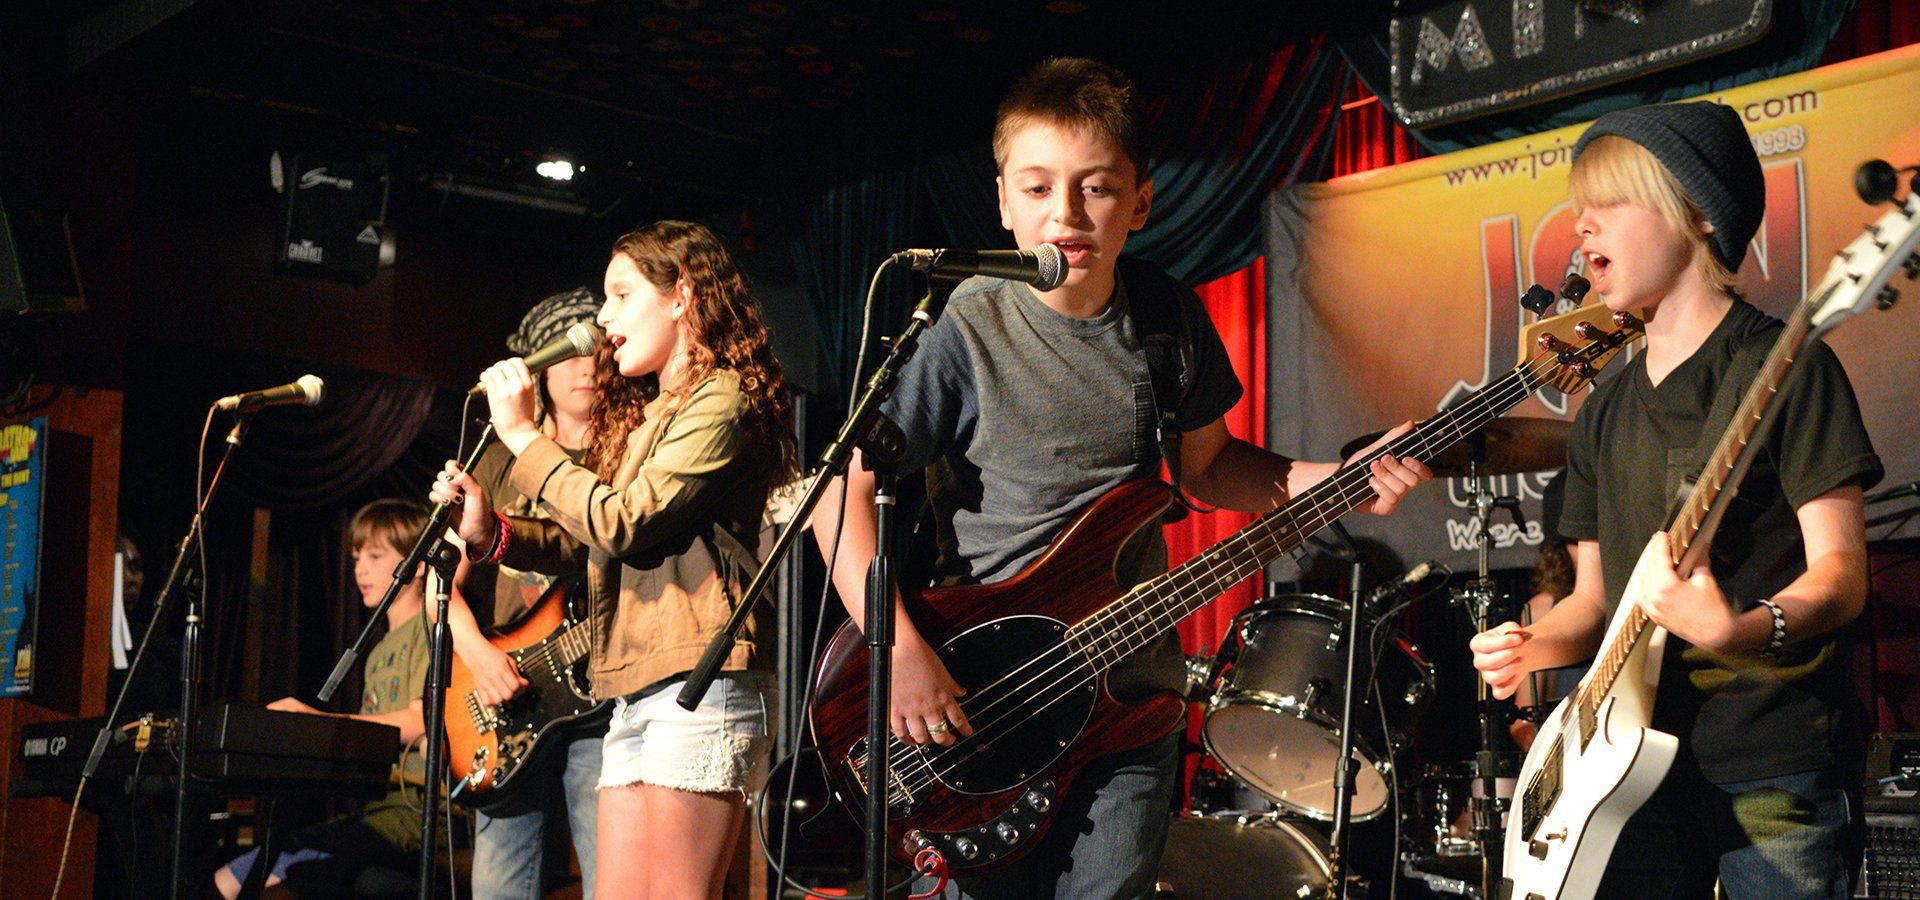 Summer Band Program - Rock Band Music Camp - 5 Kids - Sherman Oaks, Los Angeles - Join The Band